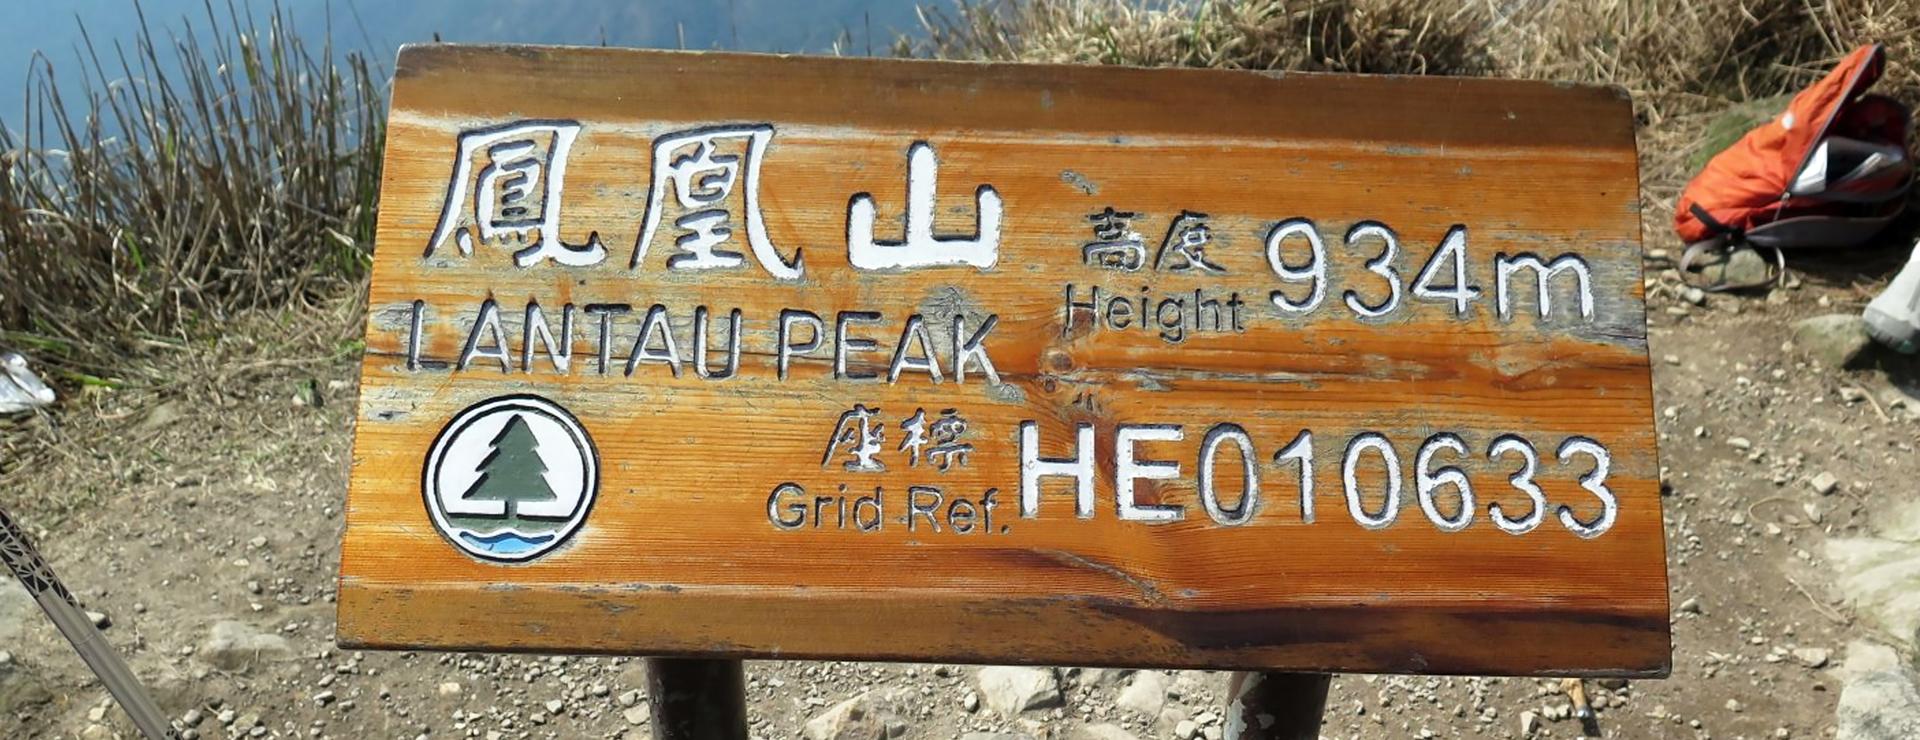 Hongkong – Lantau Peak